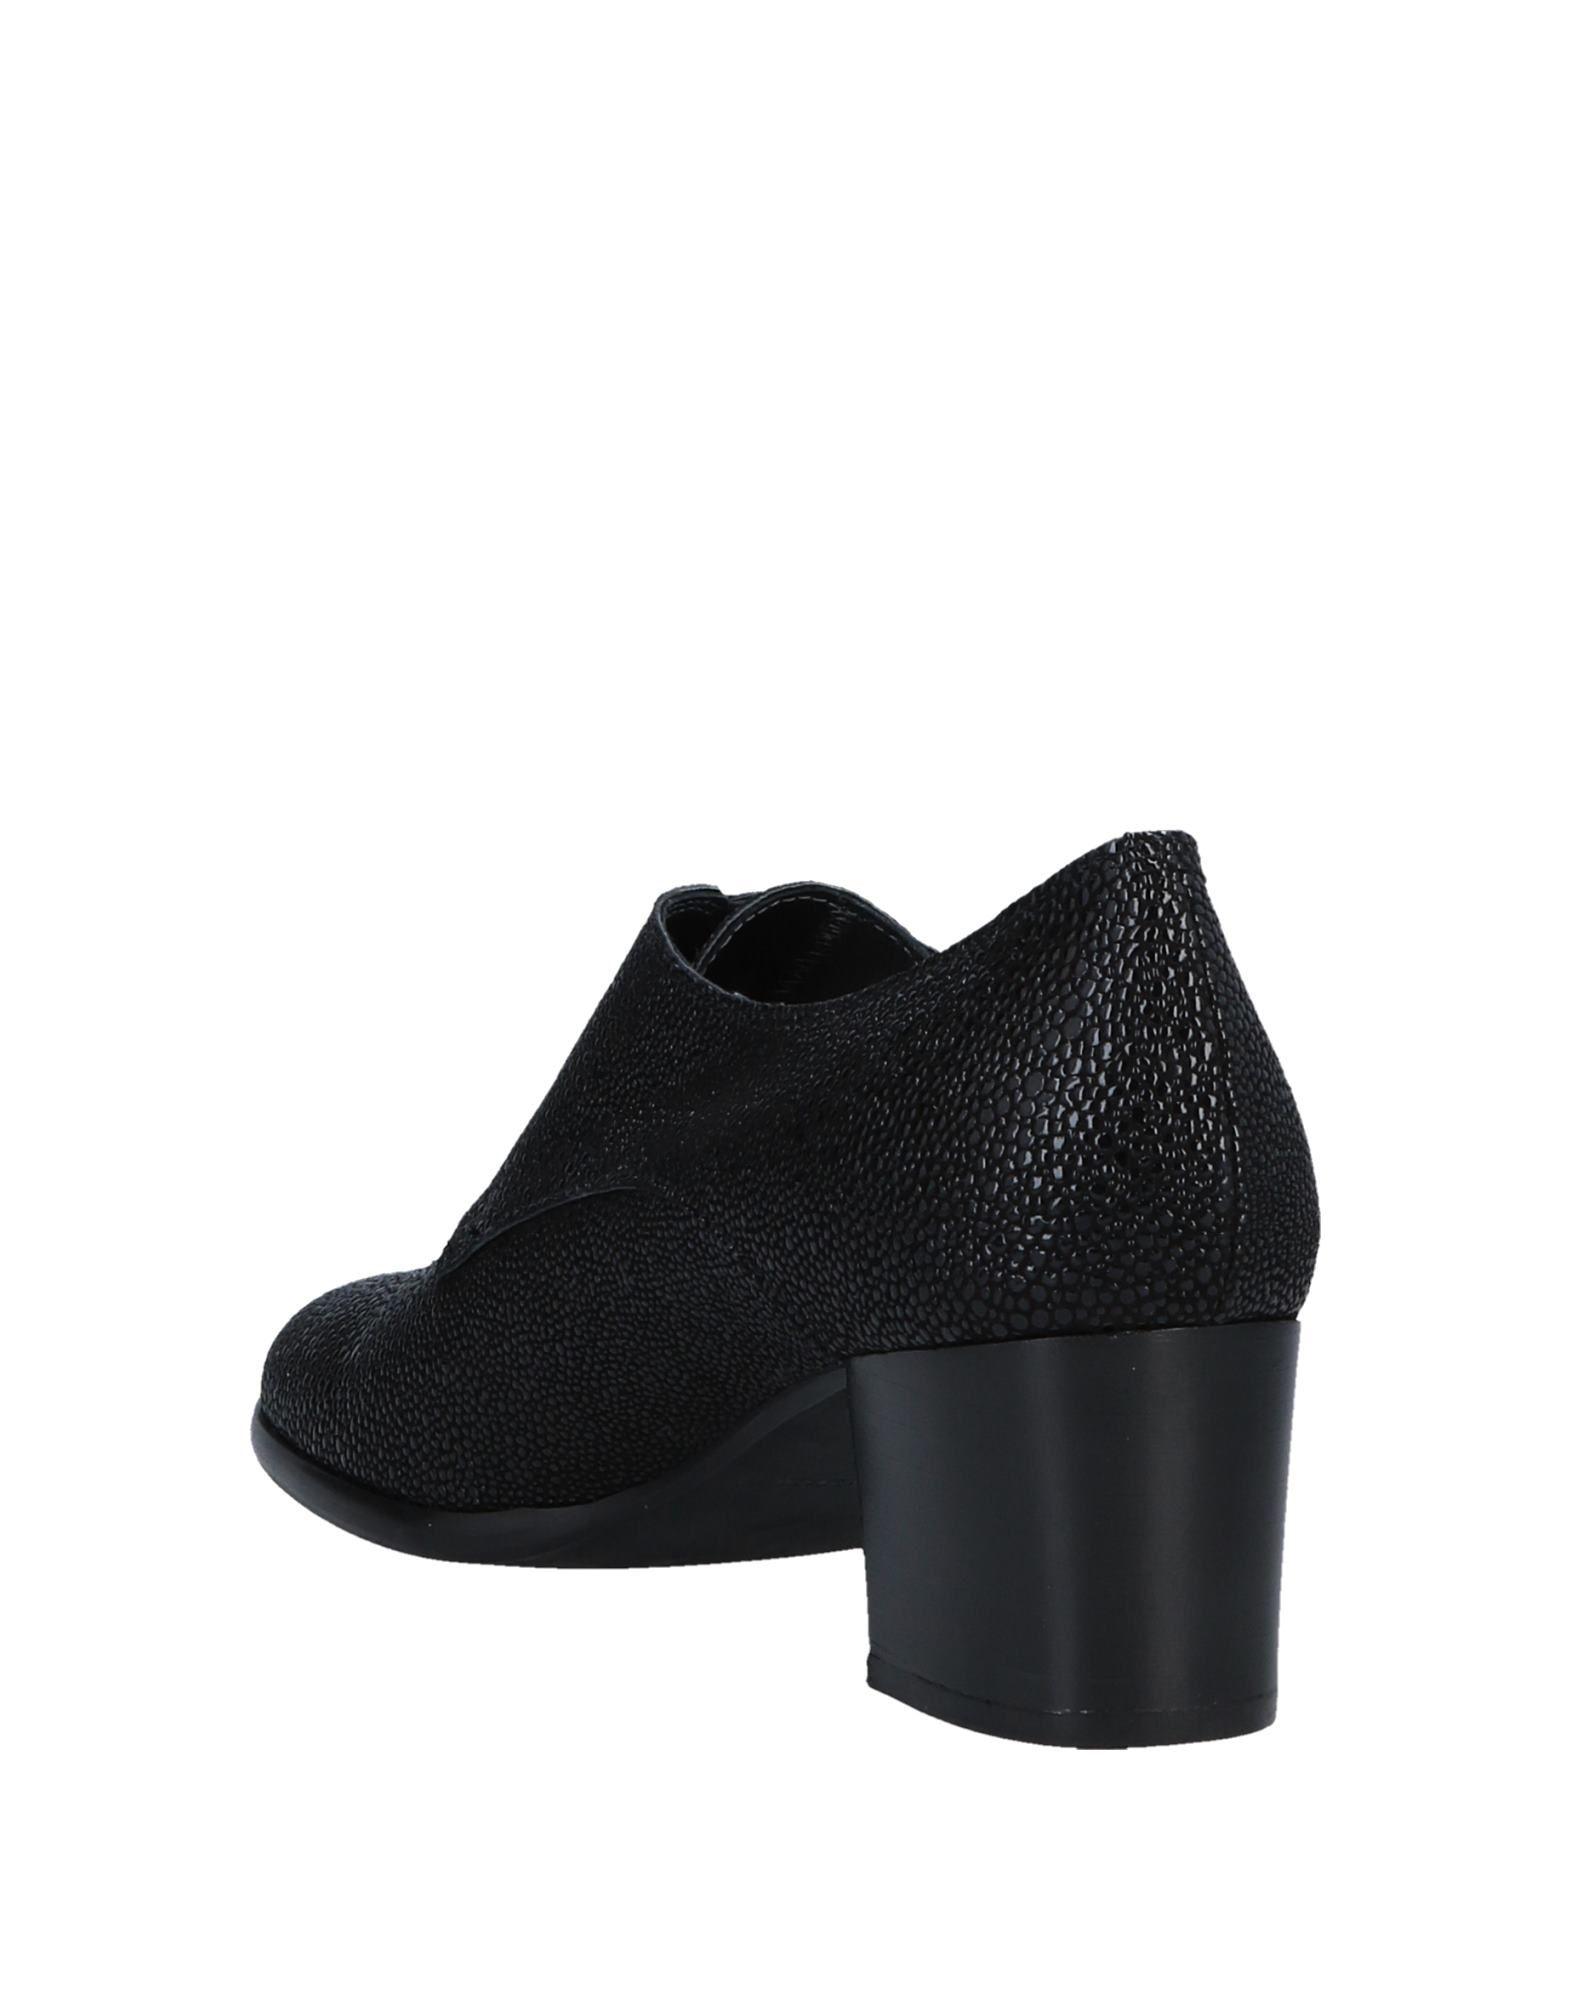 Stilvolle Schnürschuhe billige Schuhe Pons Quintana Schnürschuhe Stilvolle Damen  11258035WM 7365d0